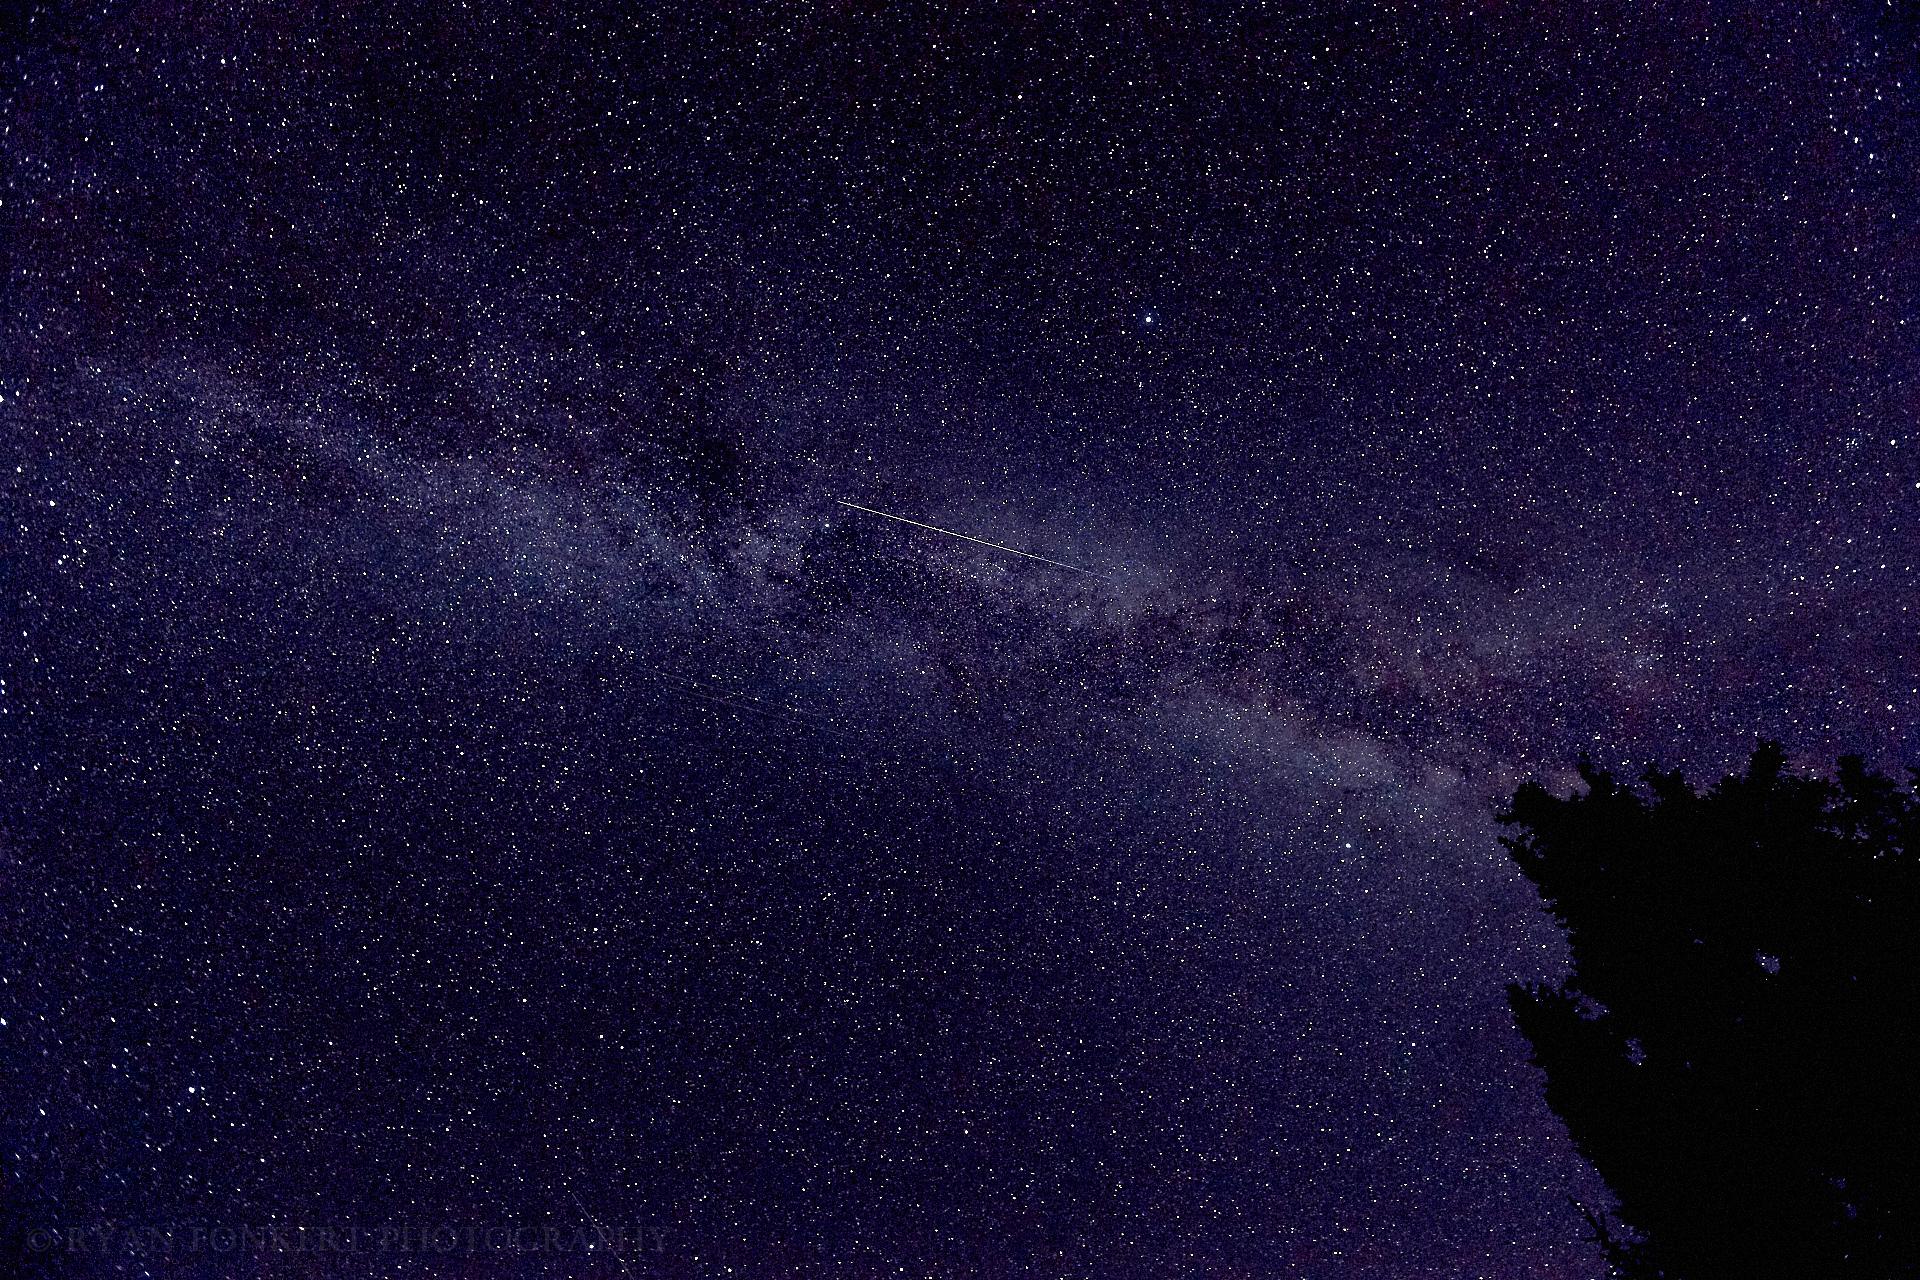 Nightscapes_DSC06834.jpg